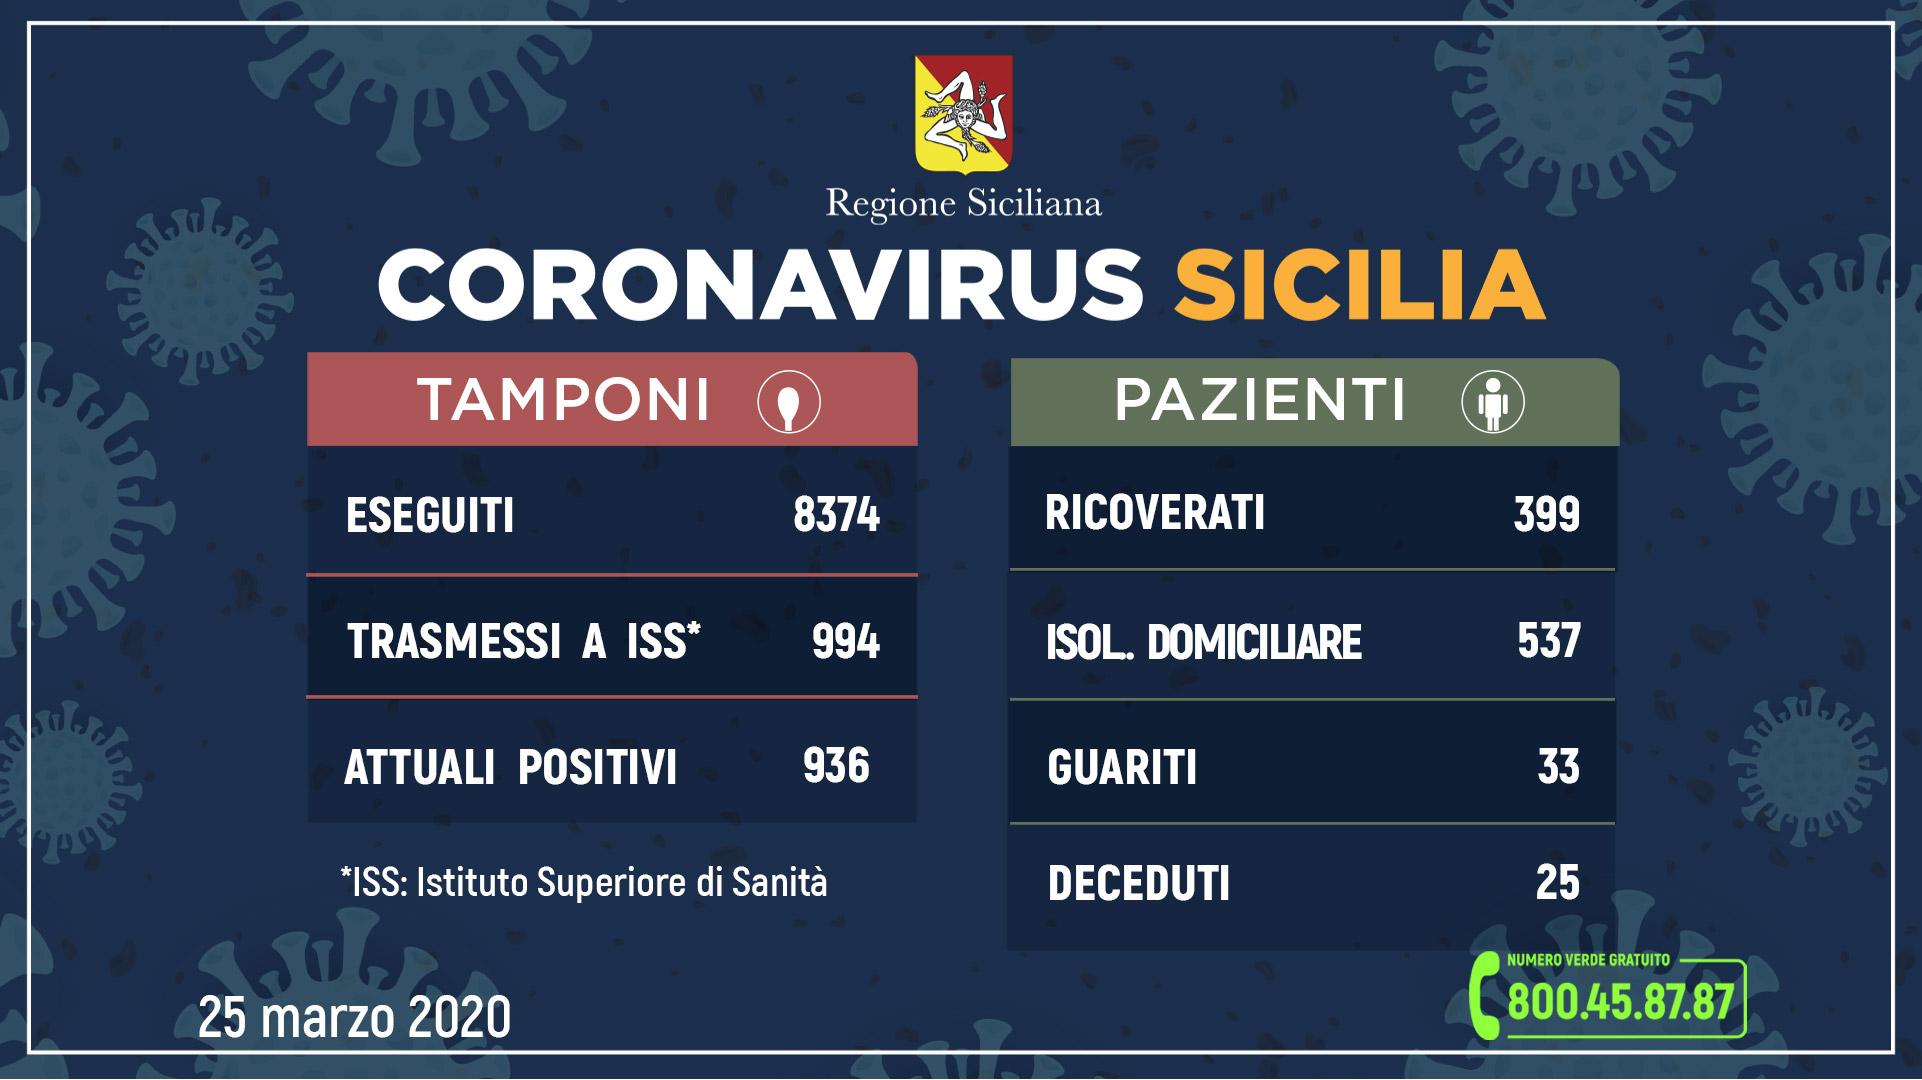 Coronavirus, in Sicilia 936 positivi, 33 guariti